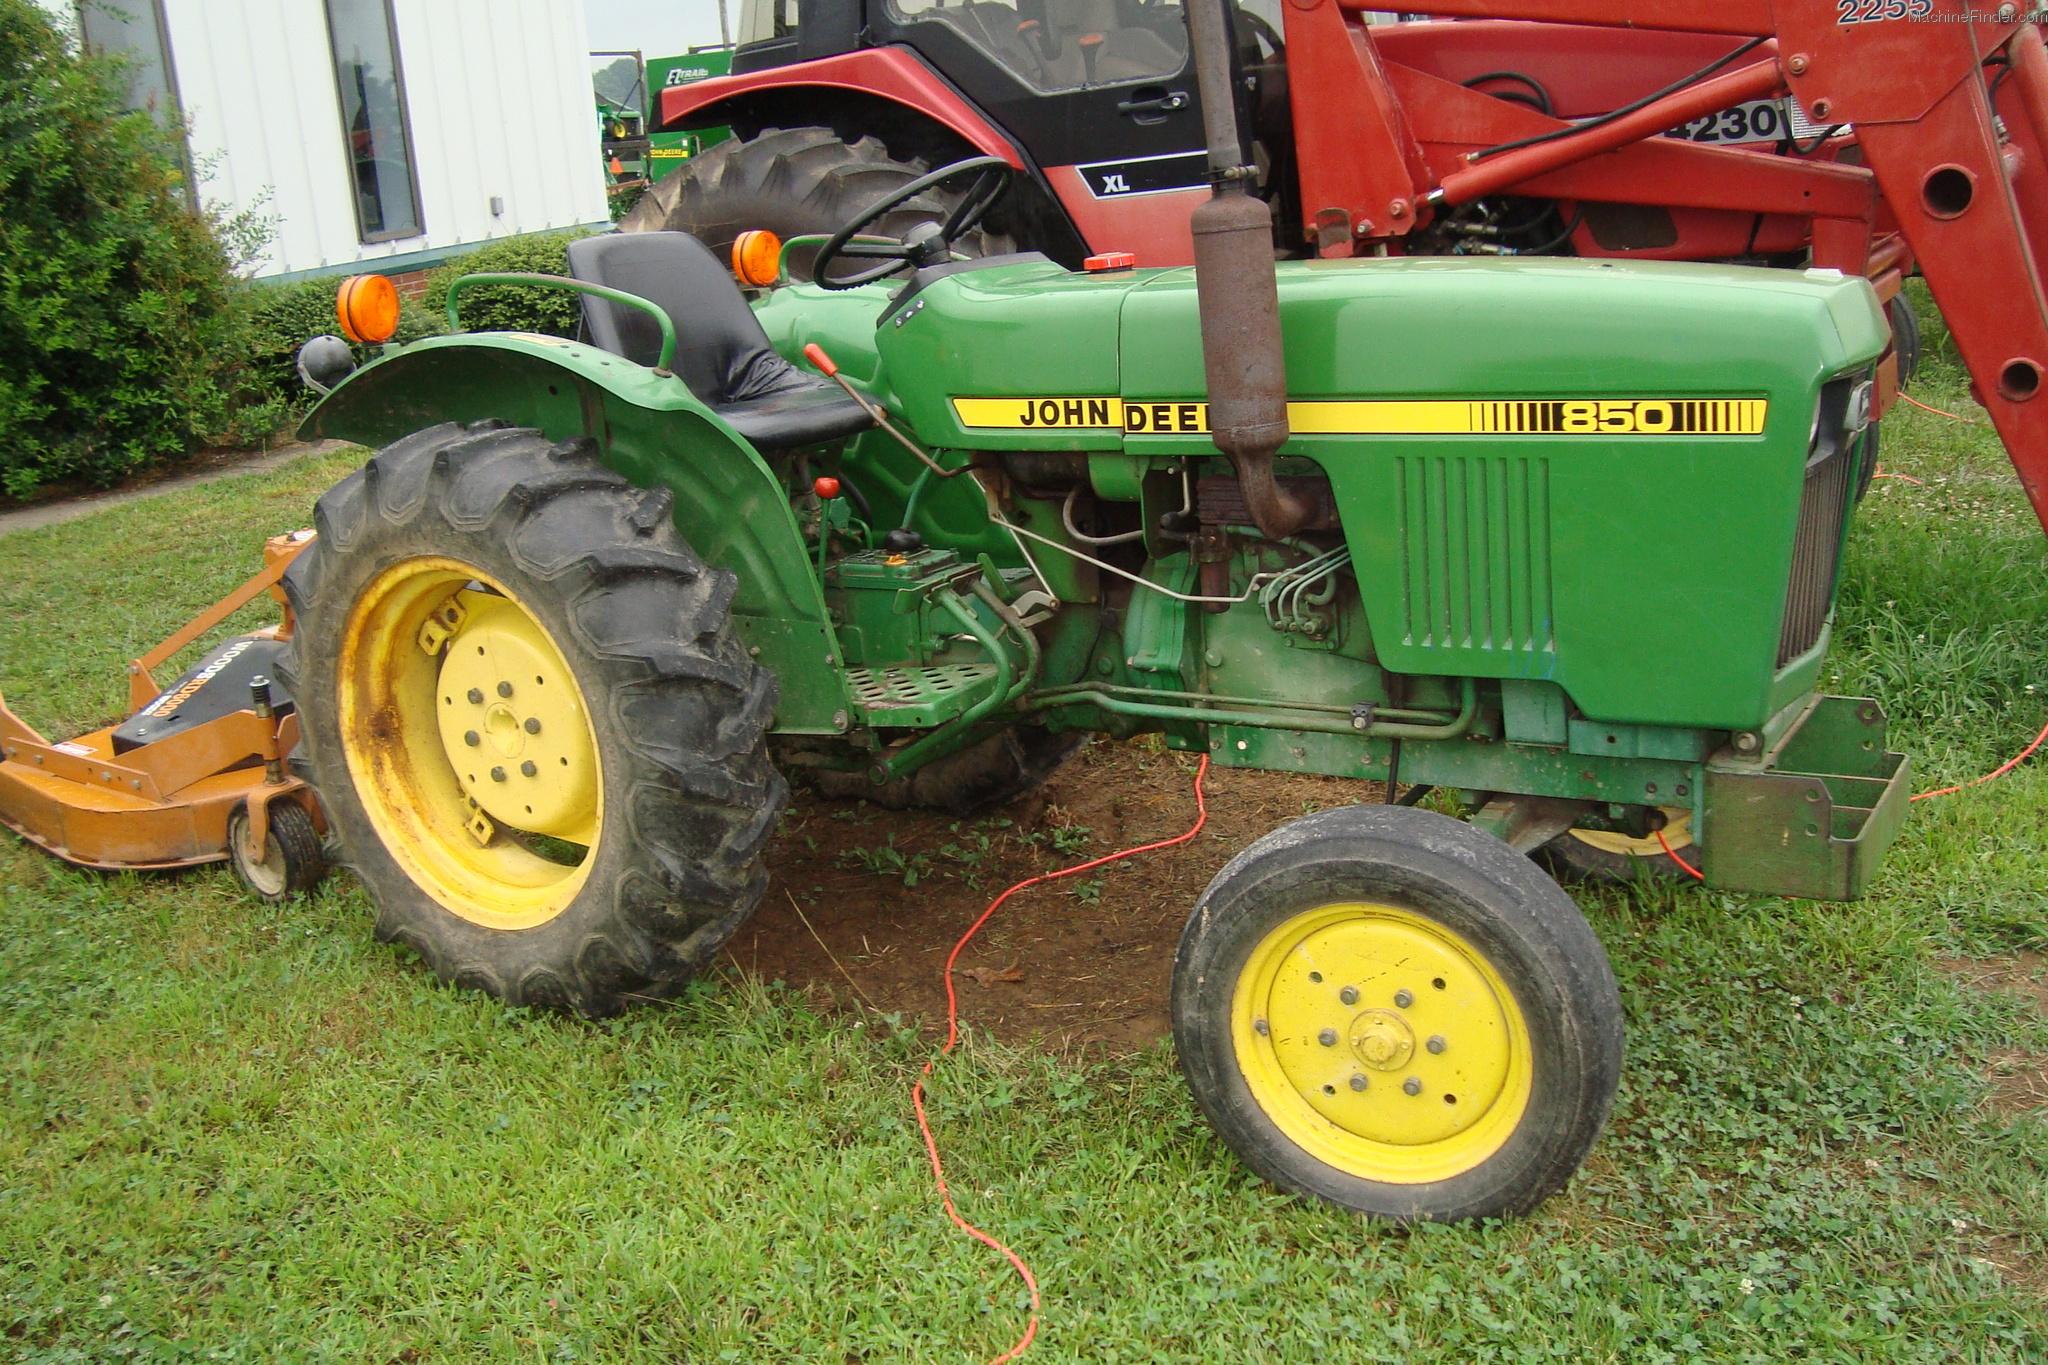 1983 John Deere 850 Tractors Compact 1 40hp John